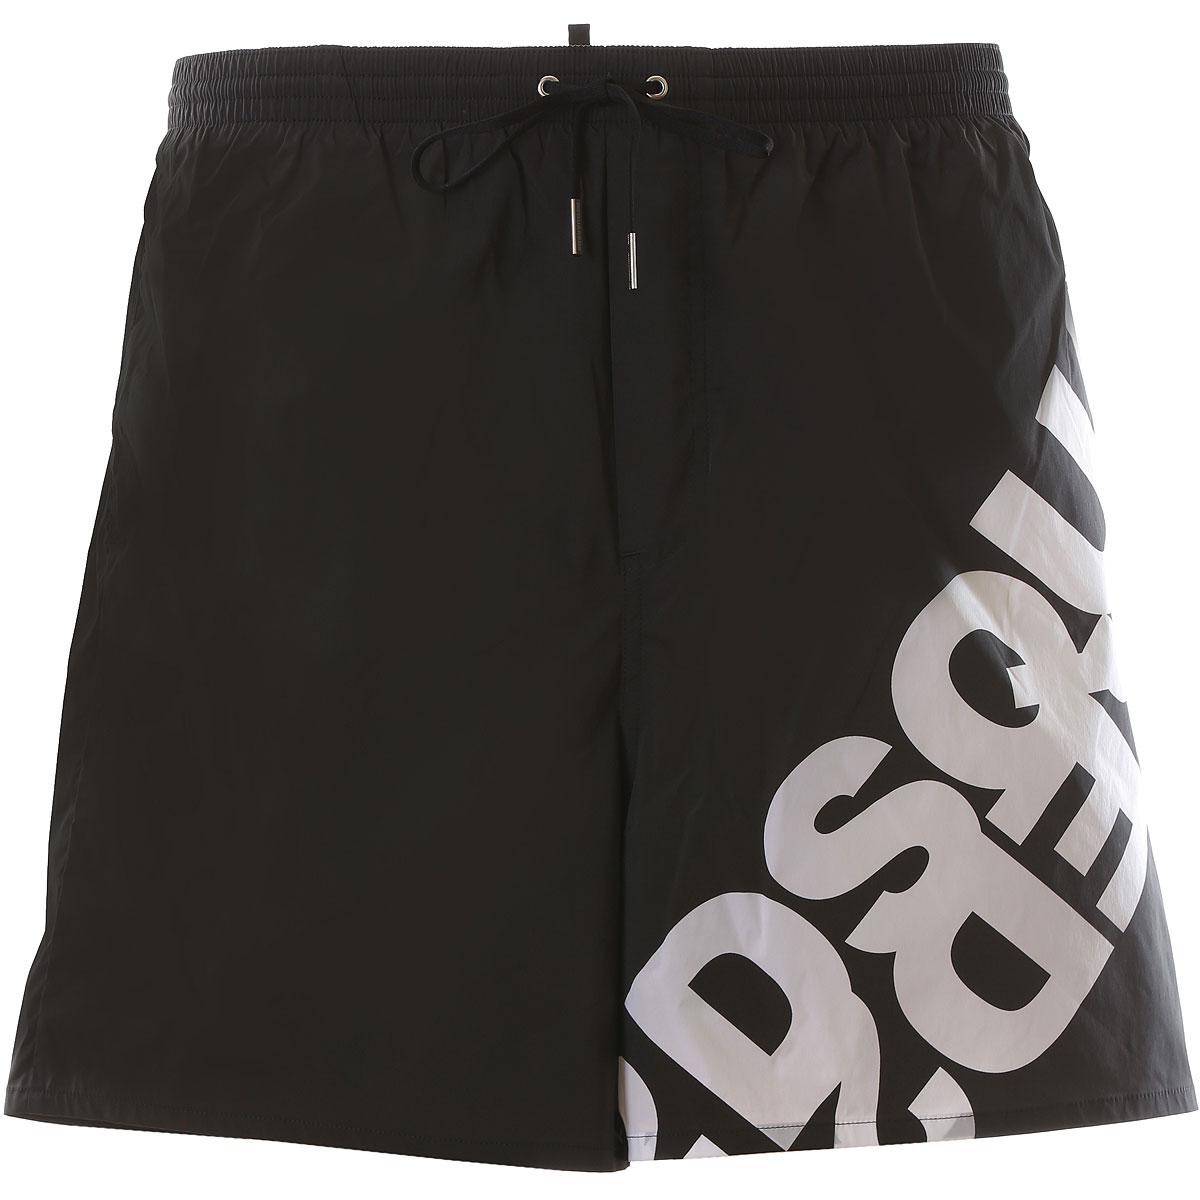 Dsquared2 Board Shorts for Men On Sale, Black, polyamide, 2019, S (EU 46) M (EU 48) L (EU 50) XL (EU 52)